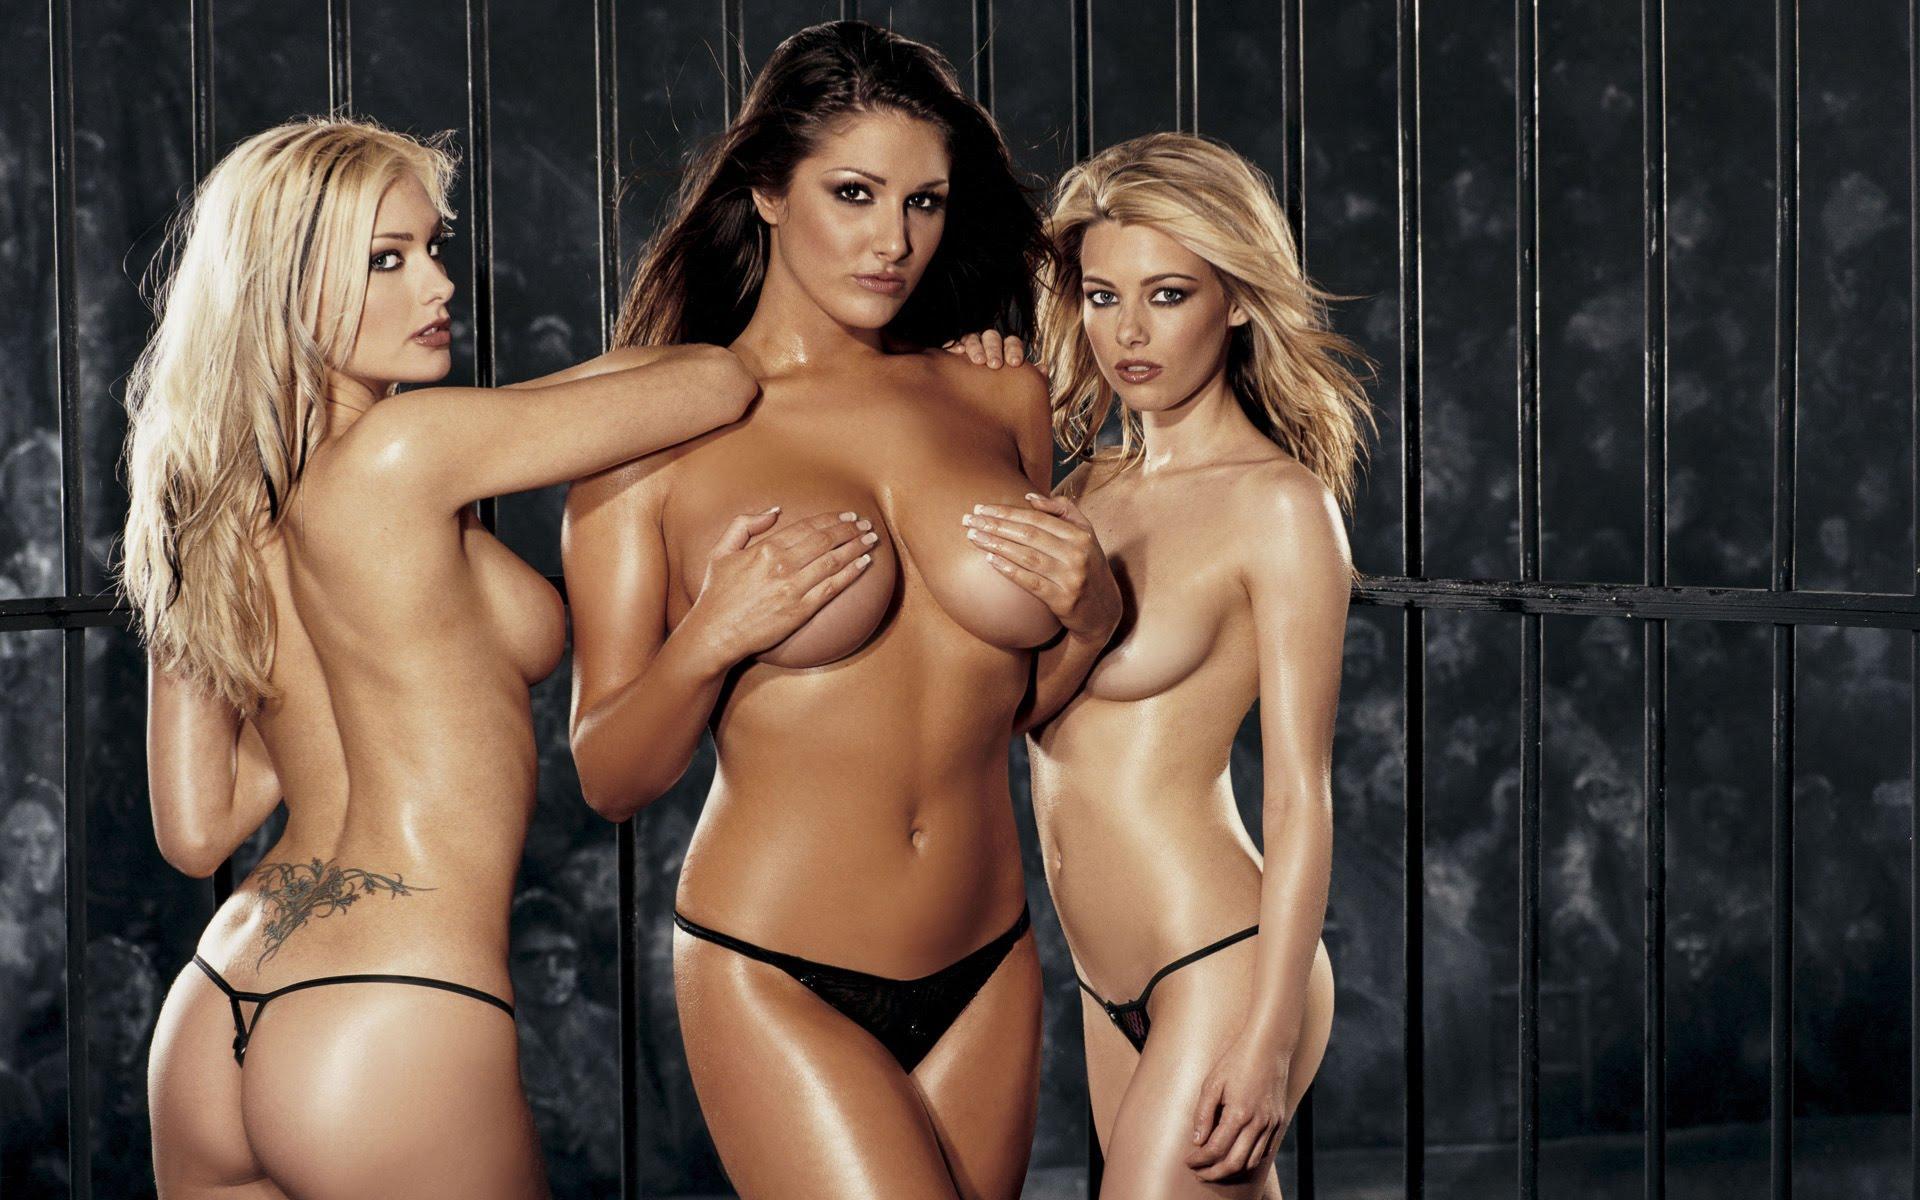 Beautiful Girls Academy; Beautiful Bikini And Lingerie Girls (Watch HD)